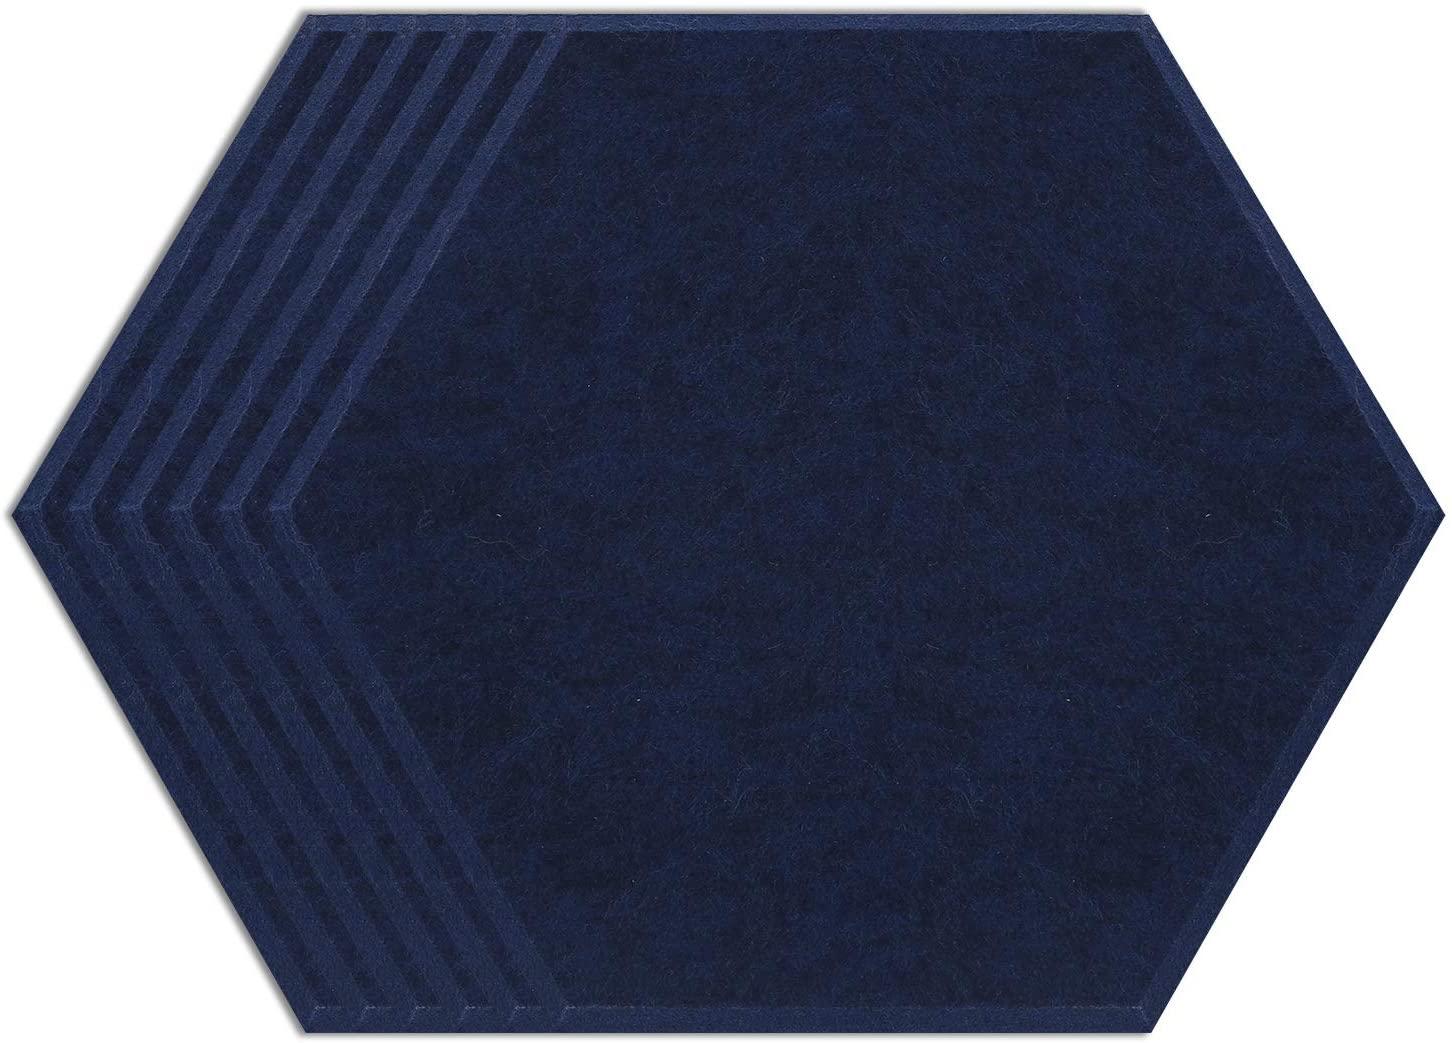 BUBOS Hexagon Acoustic Design:Art Acoustic Panels,Ultra High Density 230kg/m3 Good for Acoustic Treatment,Beveled Edge Tiles for Echo Bass Insulation,6 Pcs (Length: 14